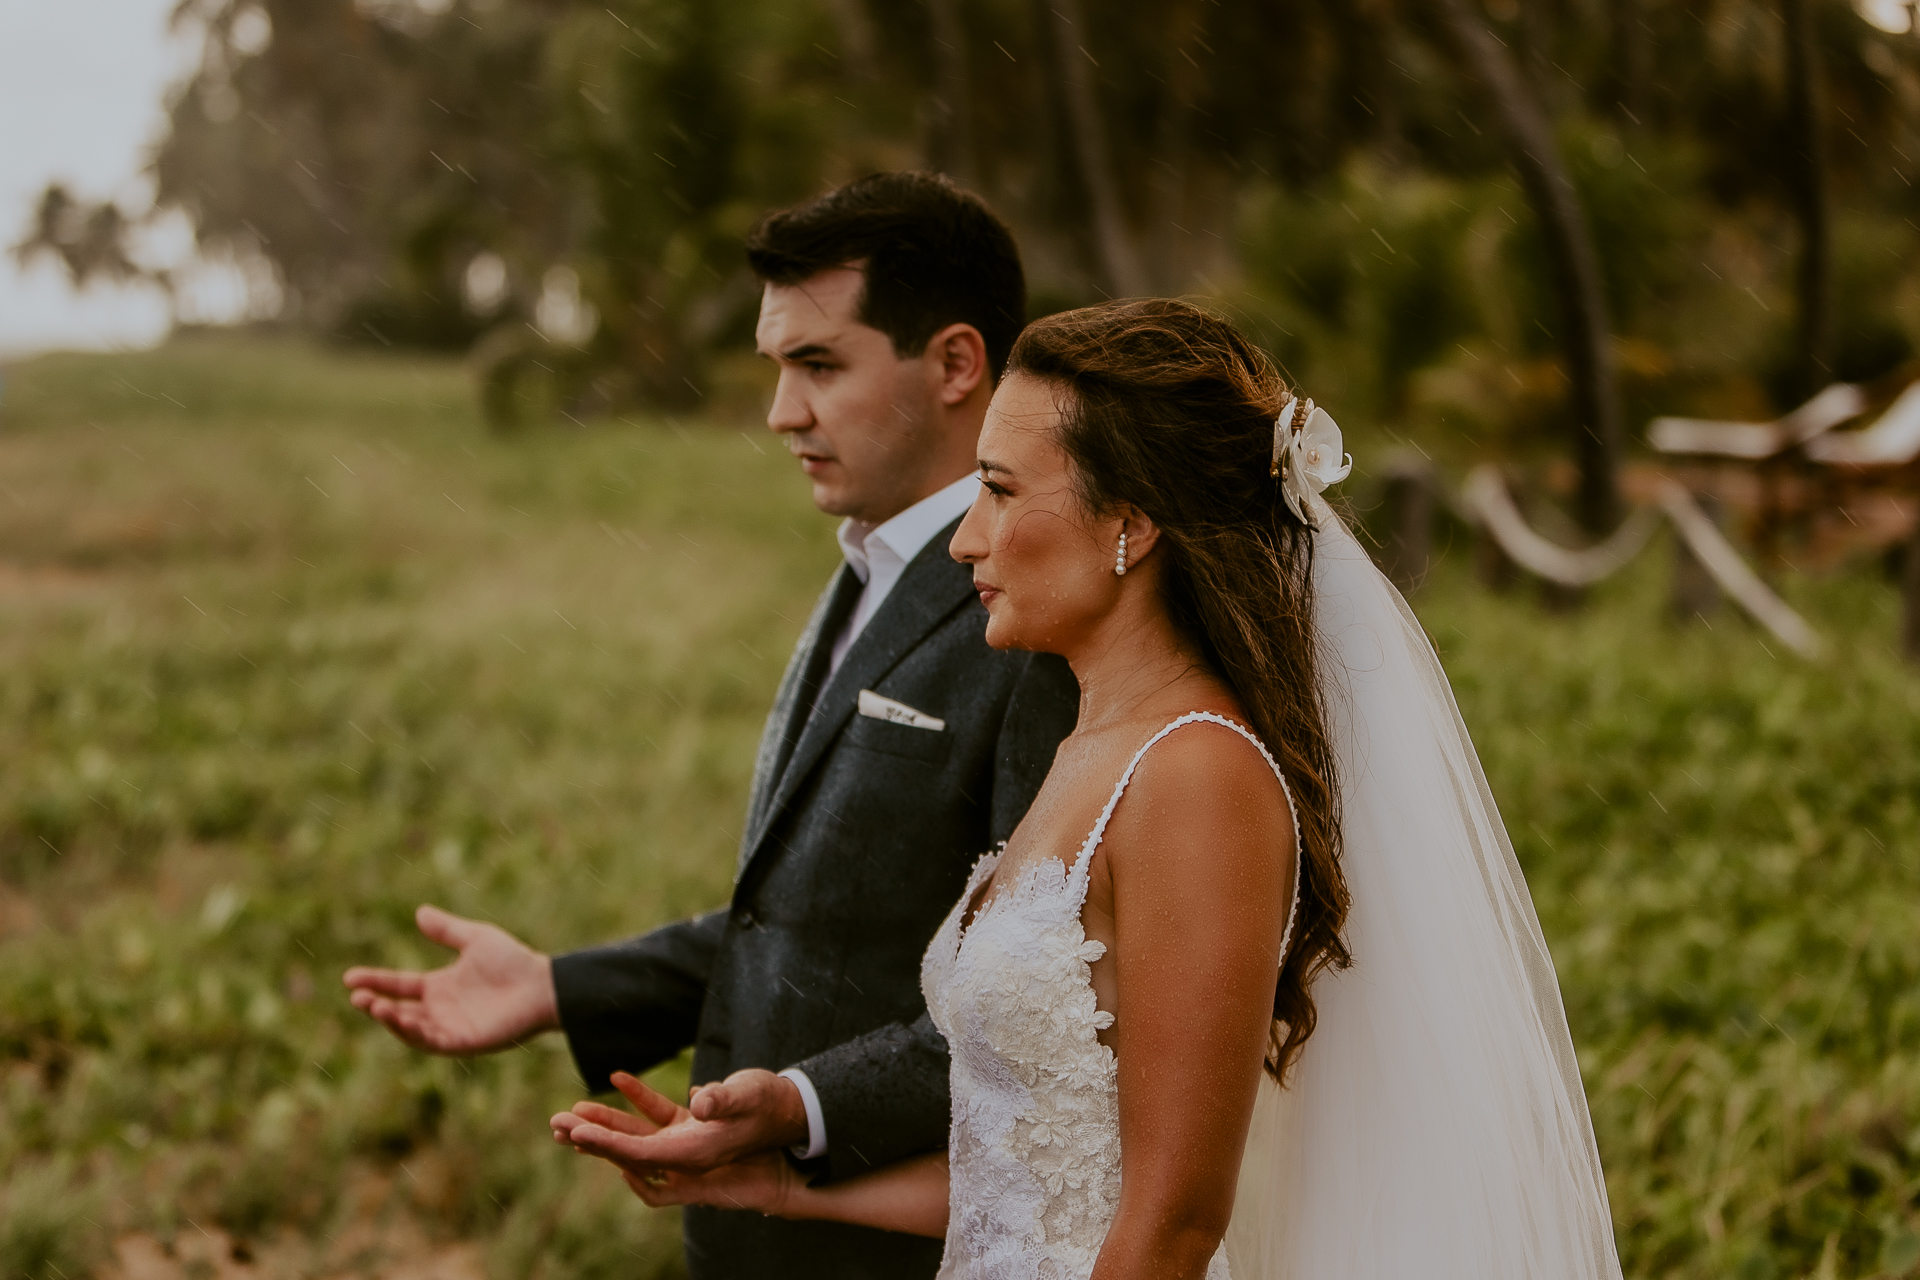 Porto de Pedras wedding ceremony photography | not viewing the rain as a detriment to their day